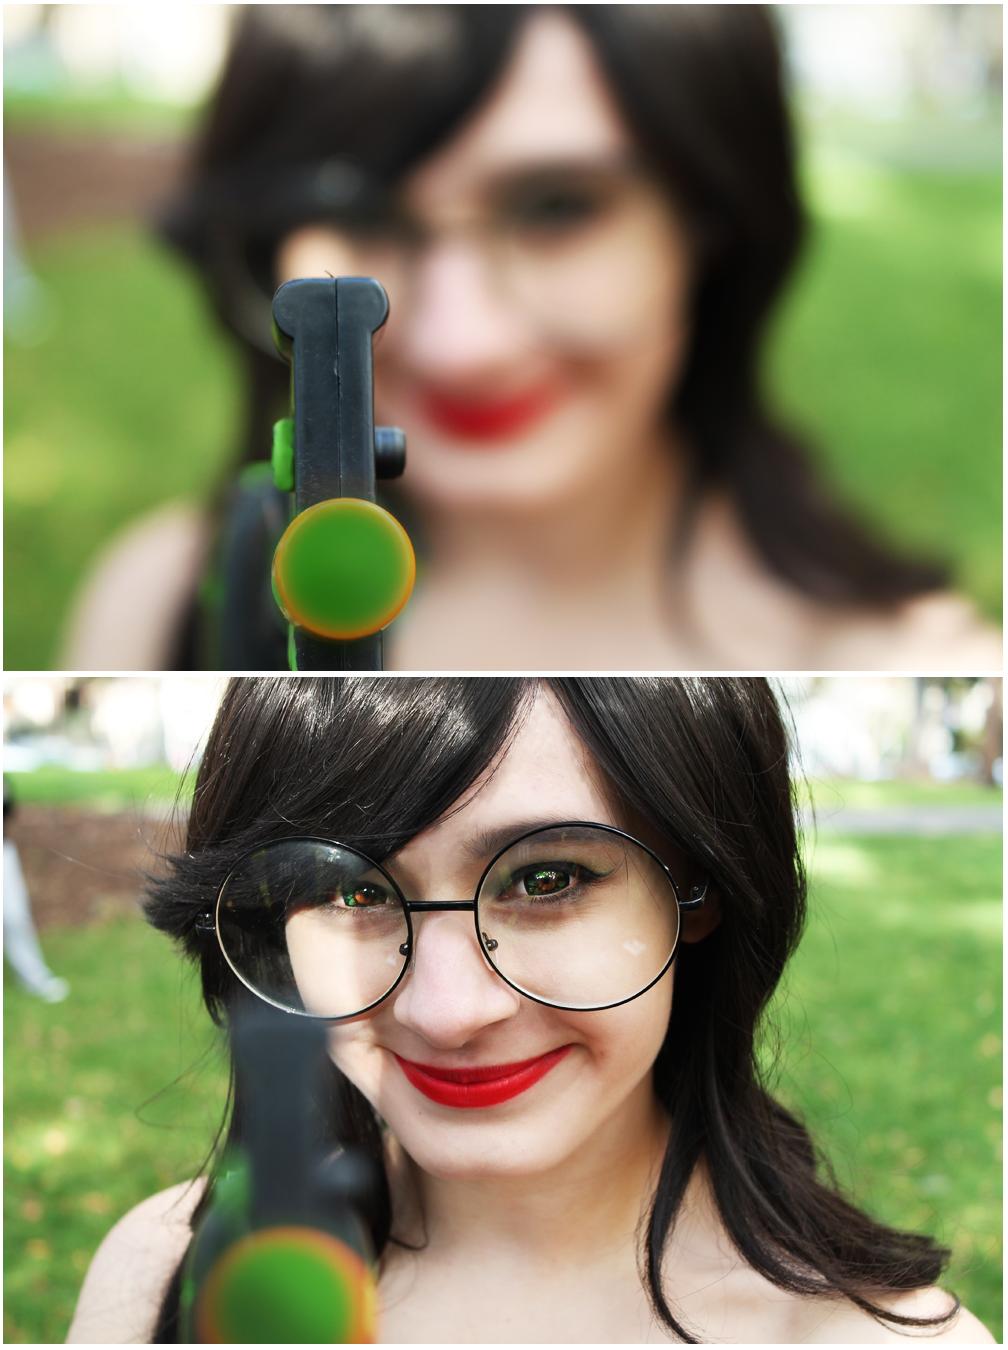 Jade Harley - Aim and Fire by Kiki-Myaki